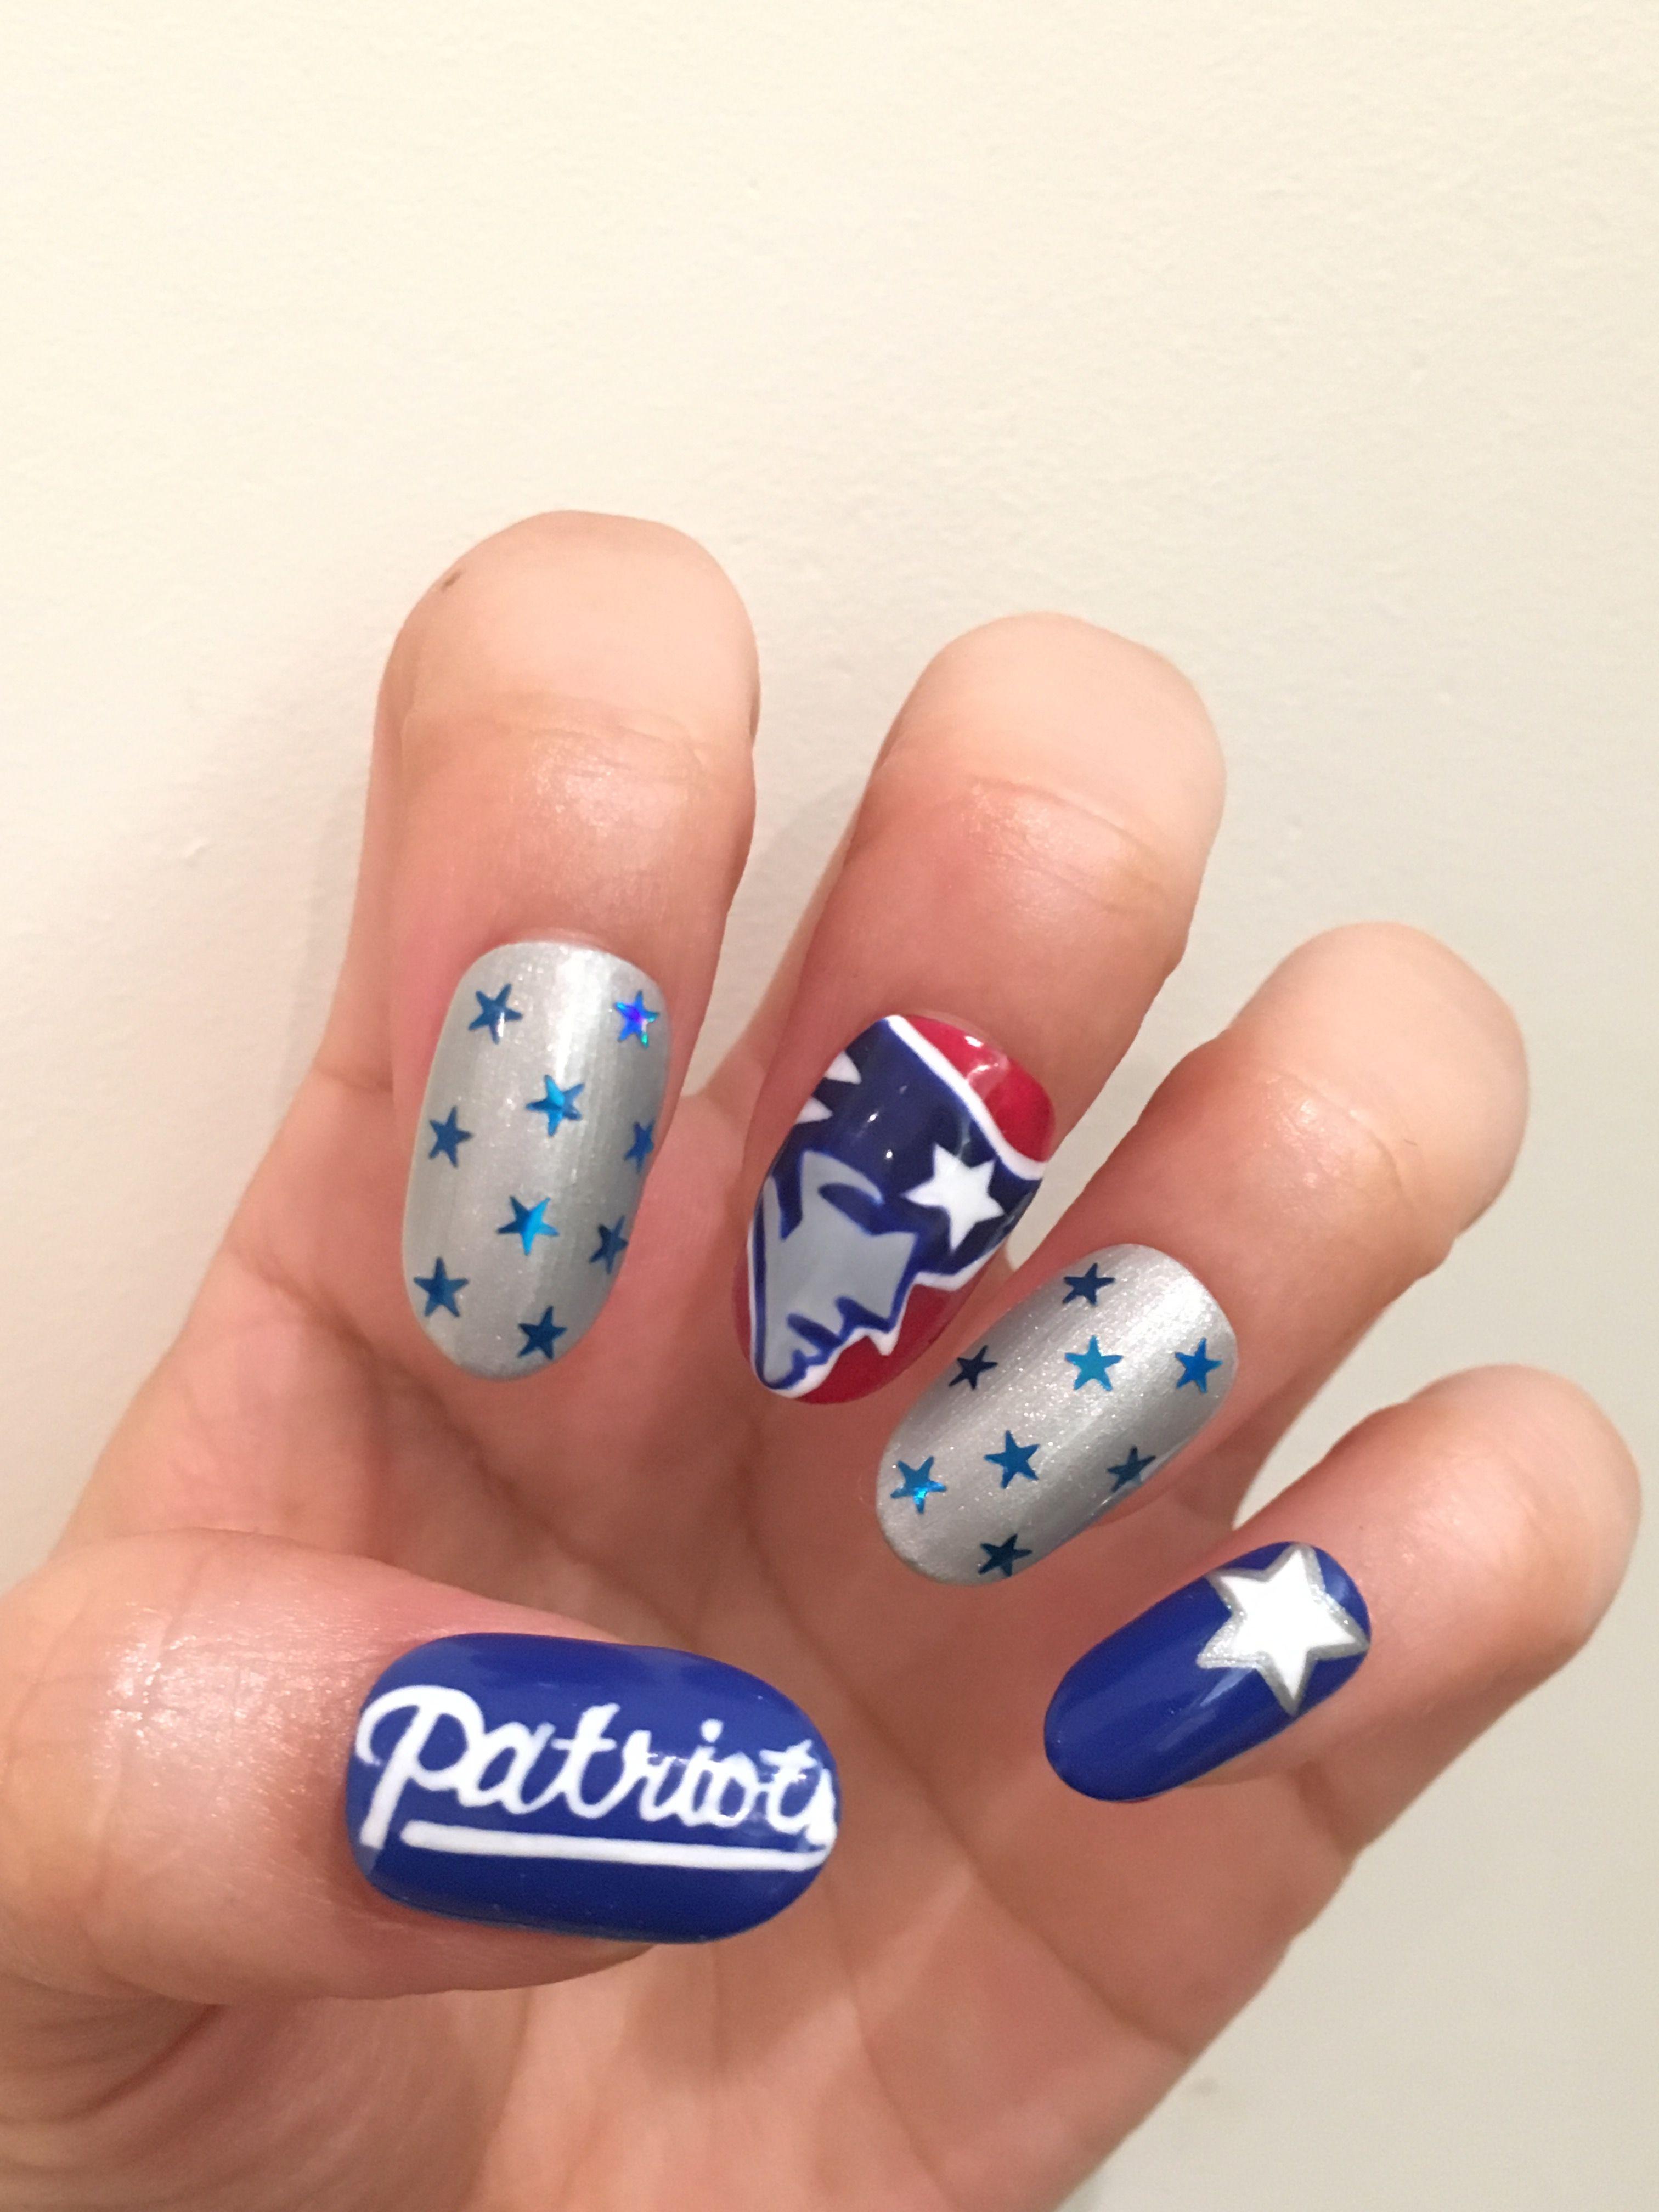 New England Patriots Nail Art | Nails | Pinterest | England patriots ...